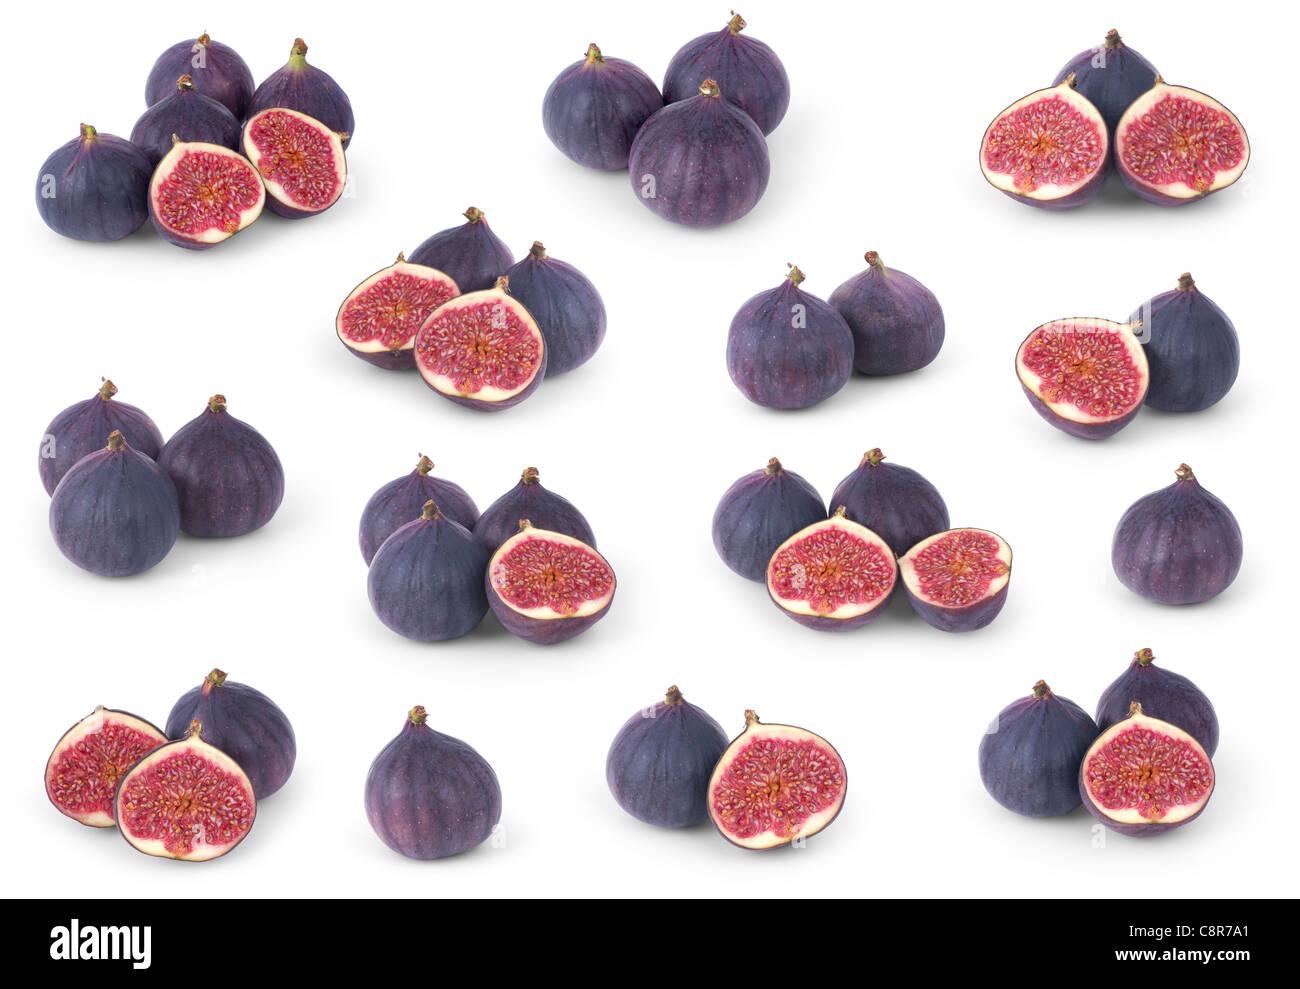 Set of figs isolated on white background - Stock Image